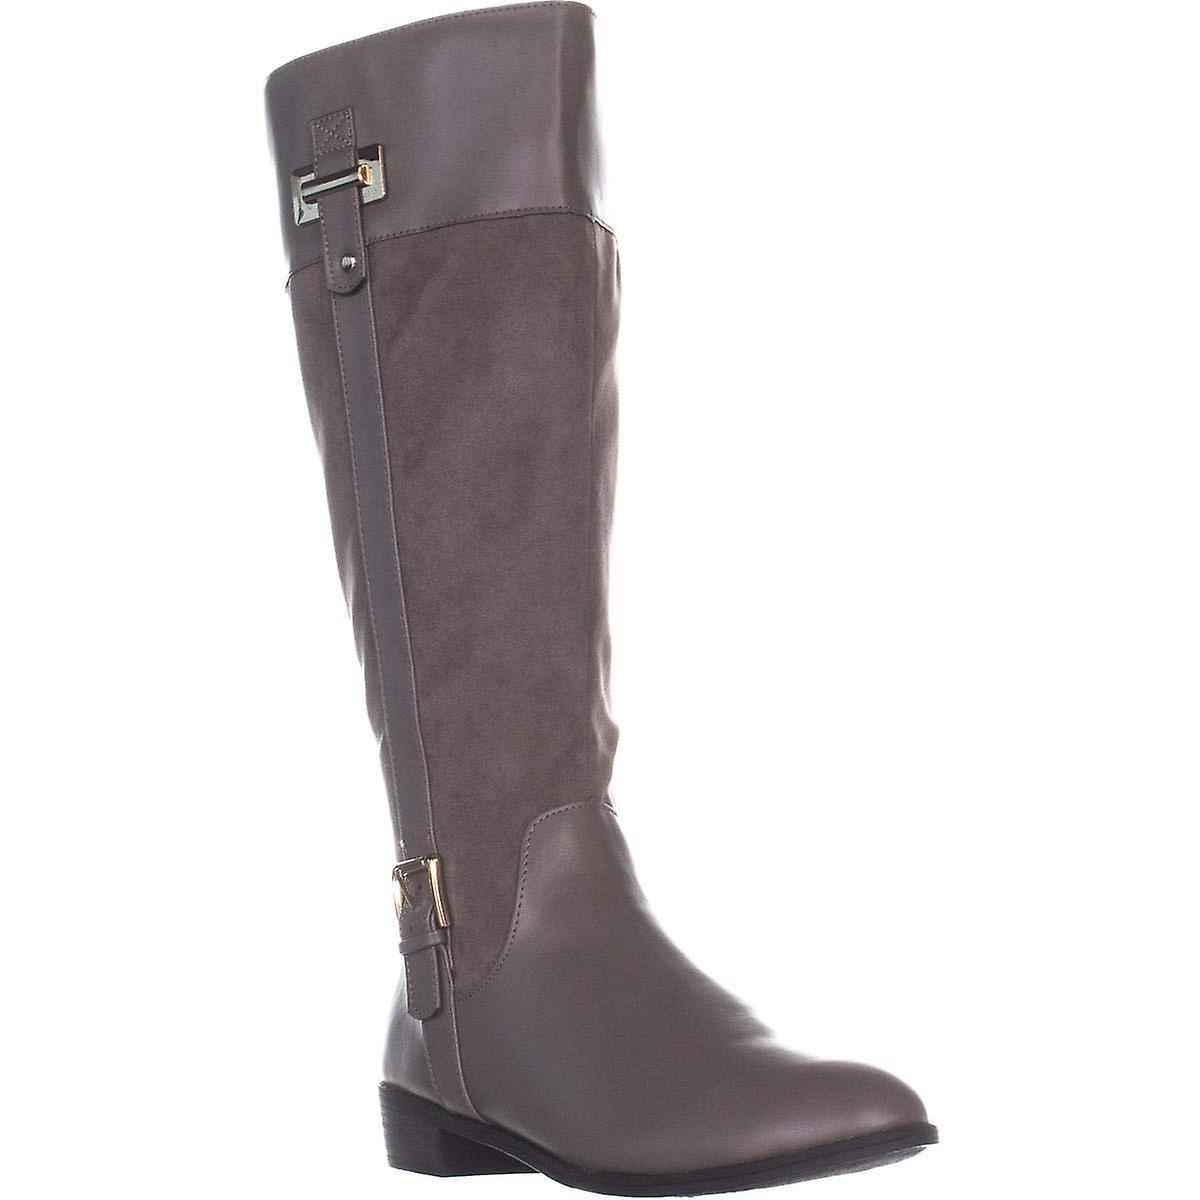 KS35 Deliee Flat Knee-High Boots, Stone  7wUW5t